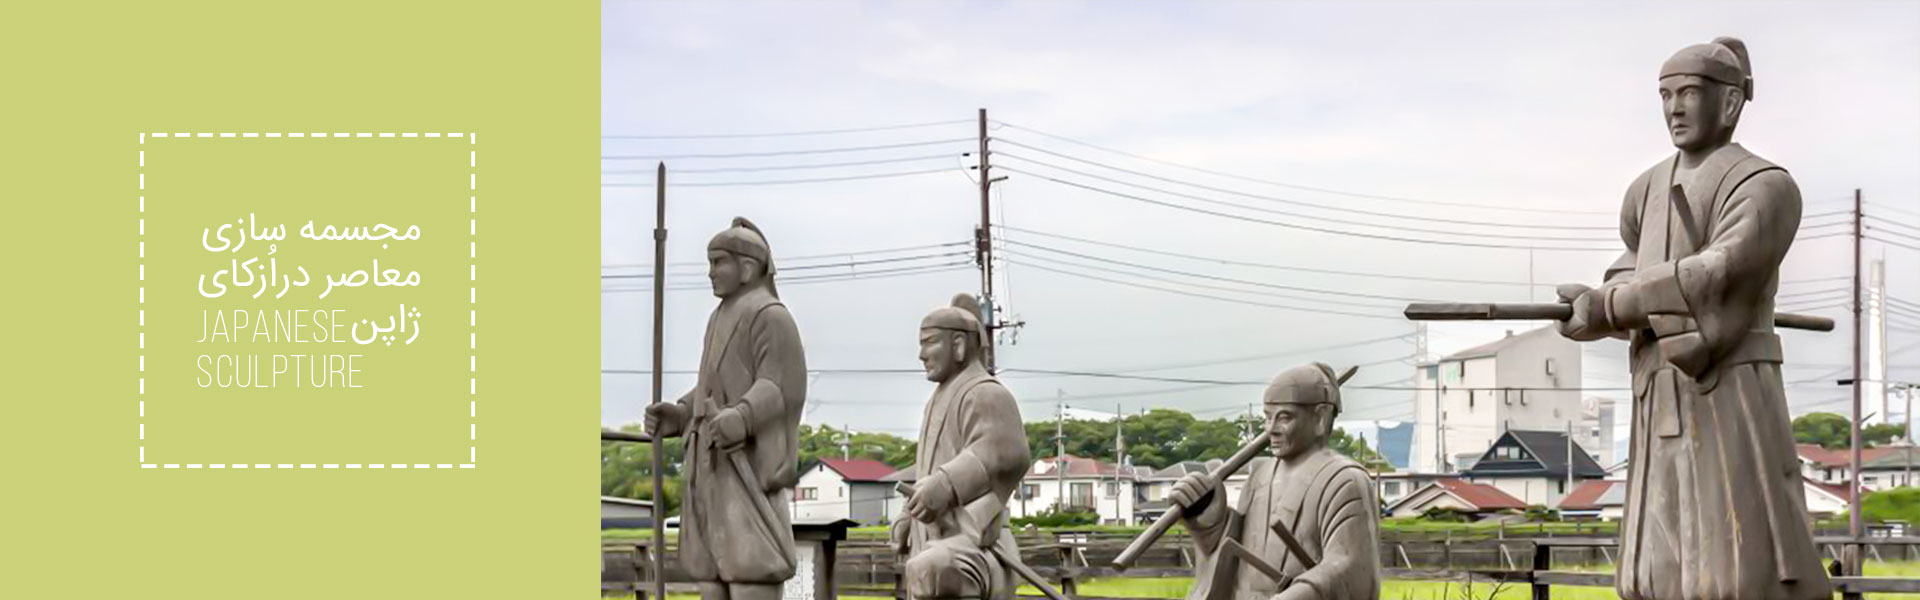 mojasamesazi osaka japan - مجسمه سازی معاصر دراُزکای ژاپن